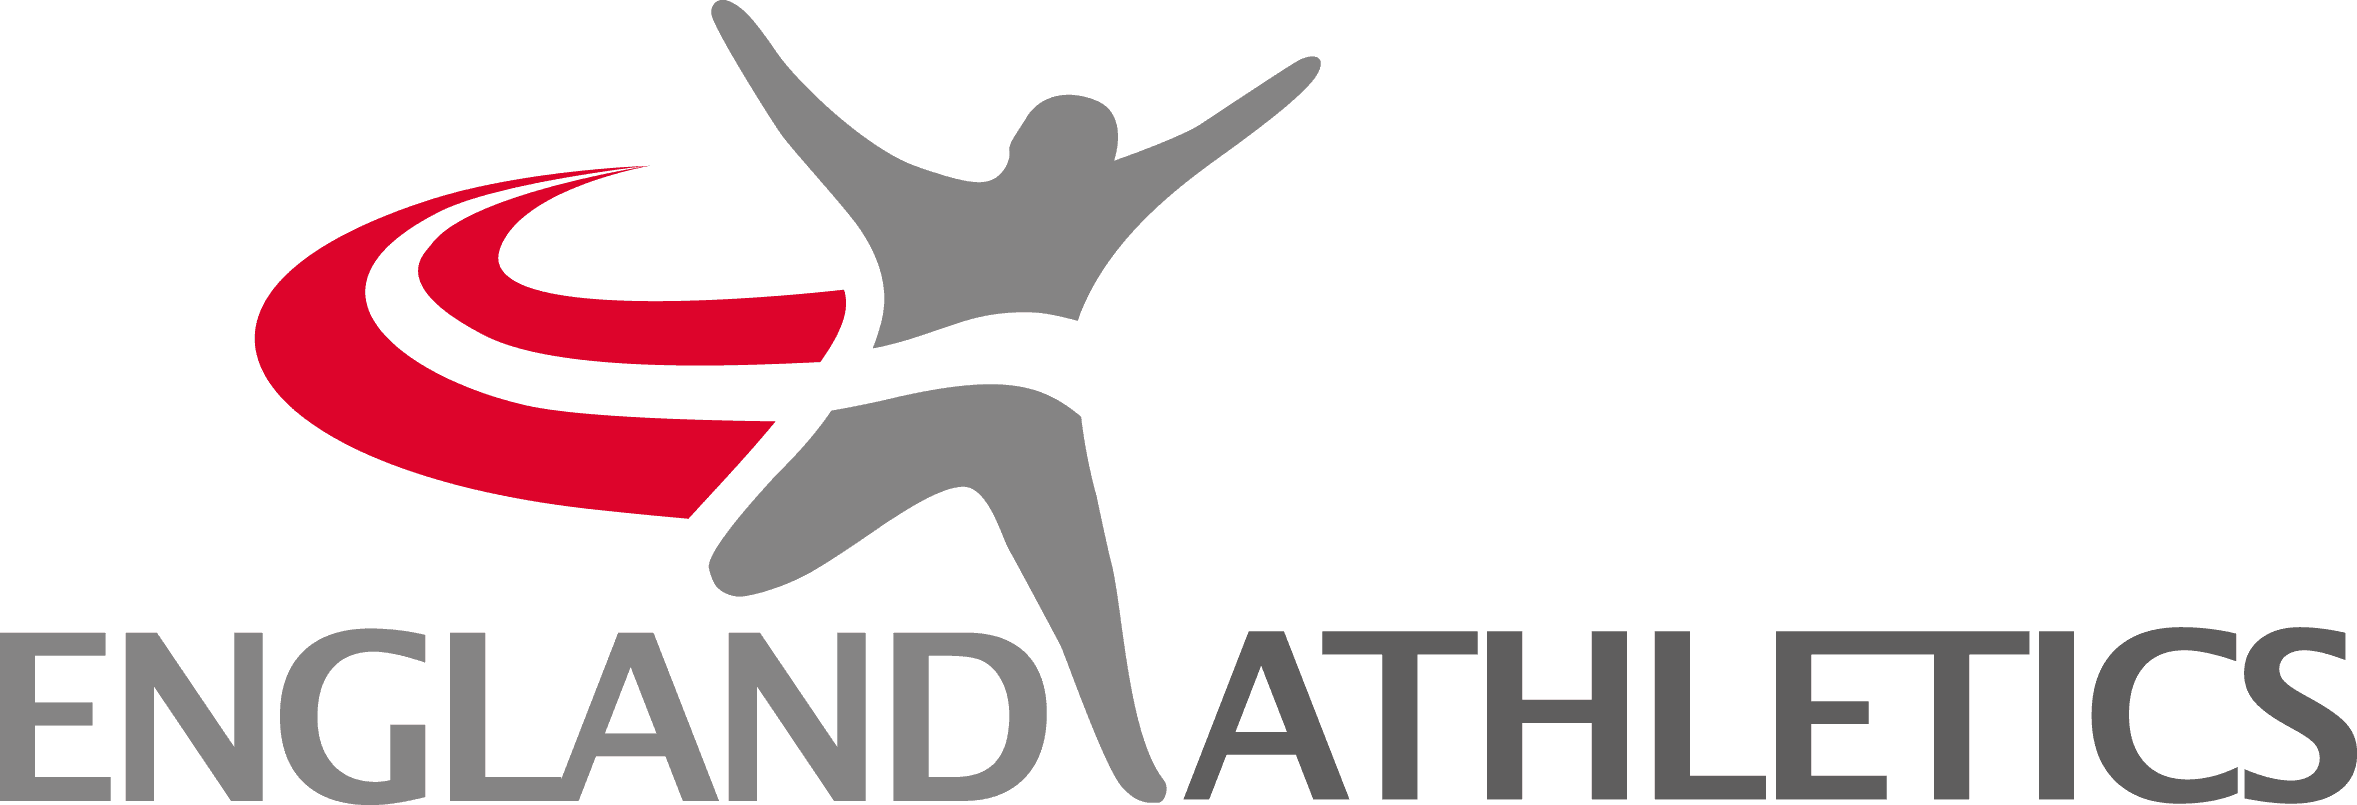 Polytan UK Cooperation with England Athletics